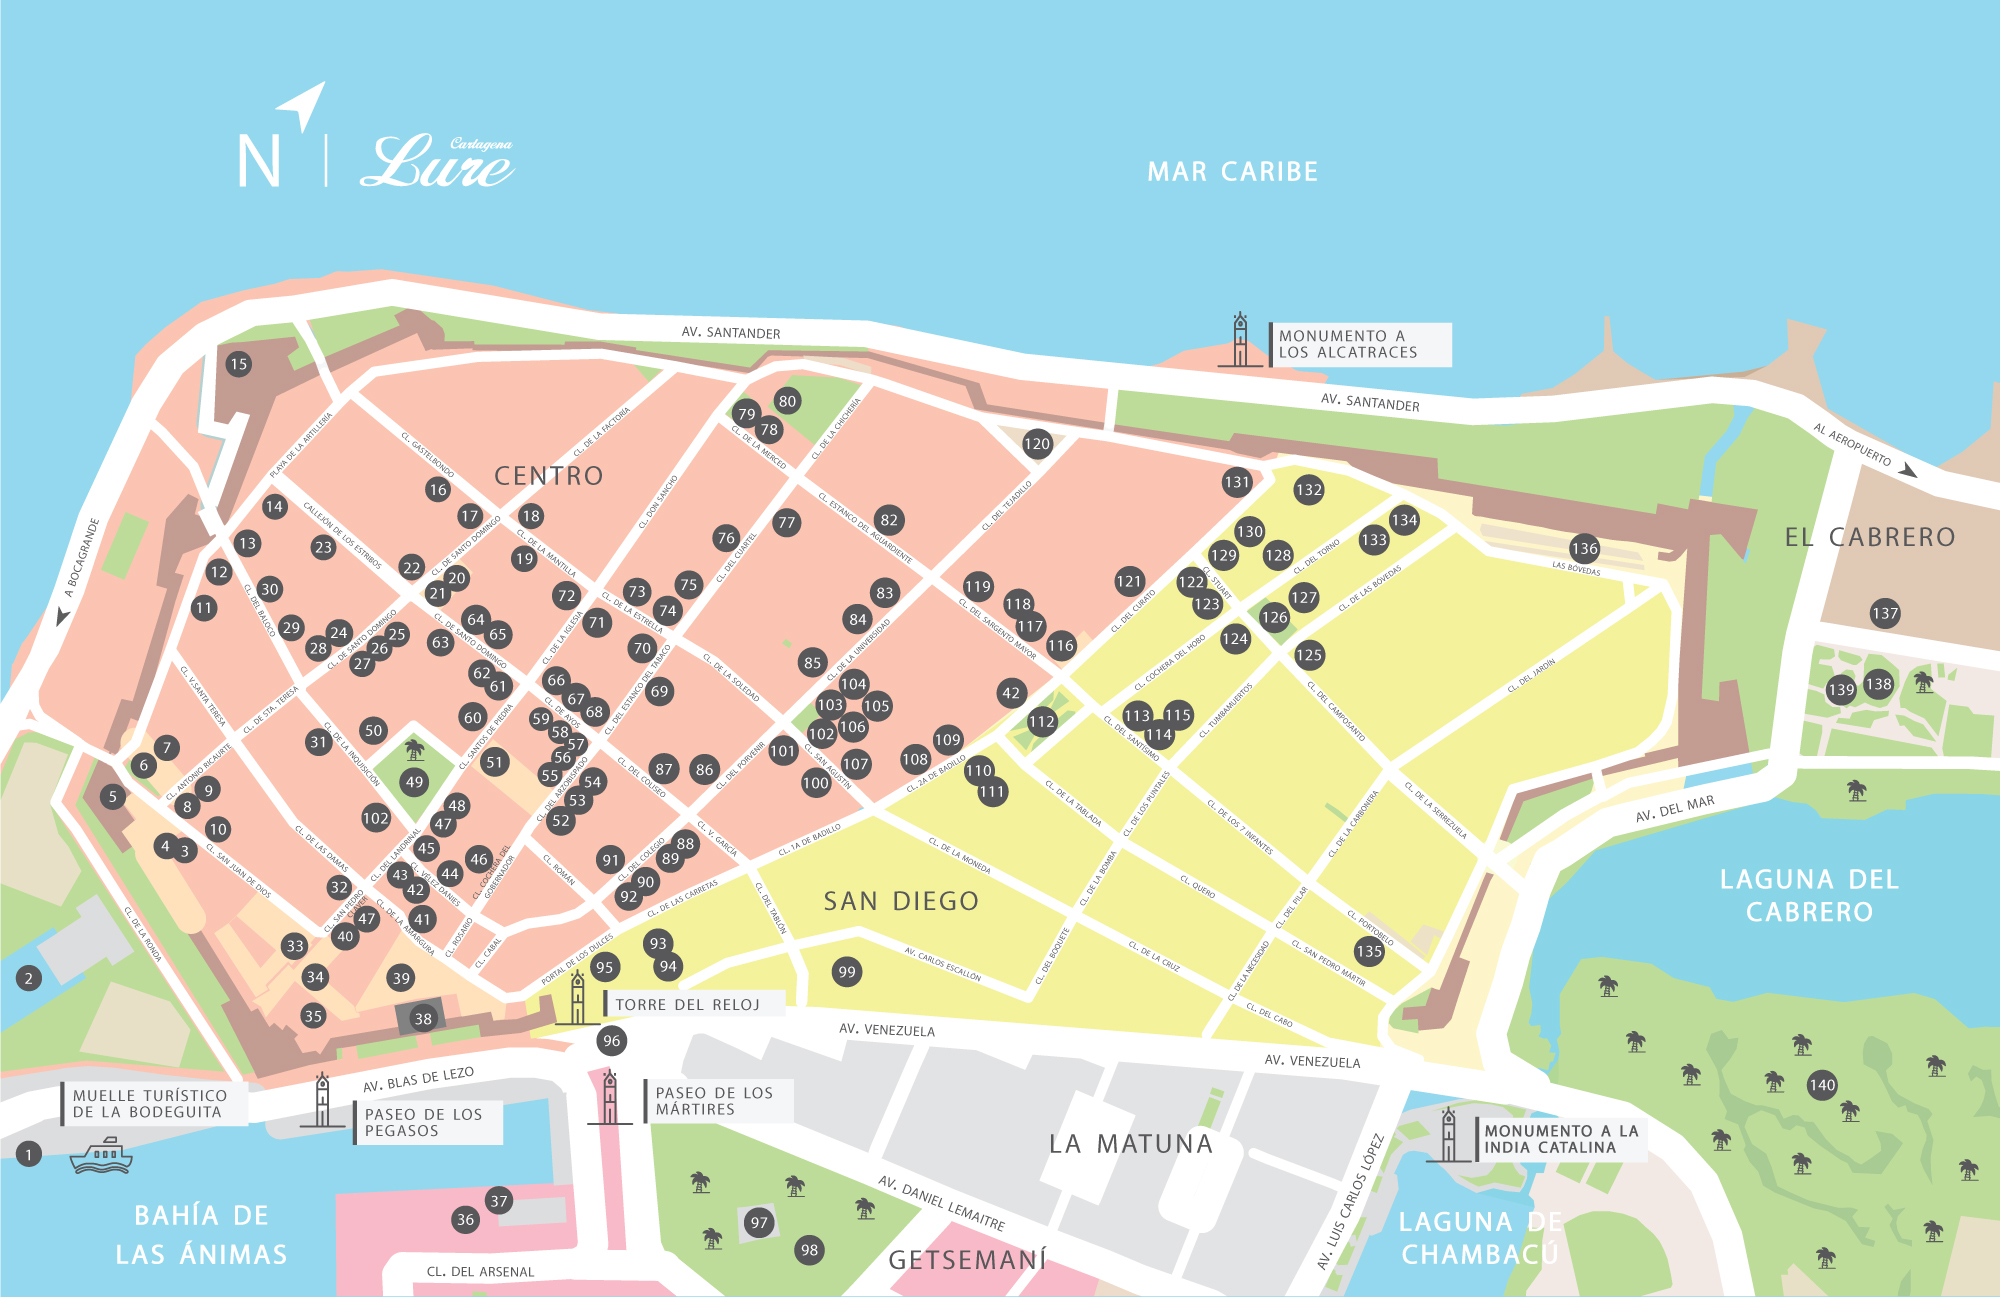 lure_mapa_centro_CTG_10